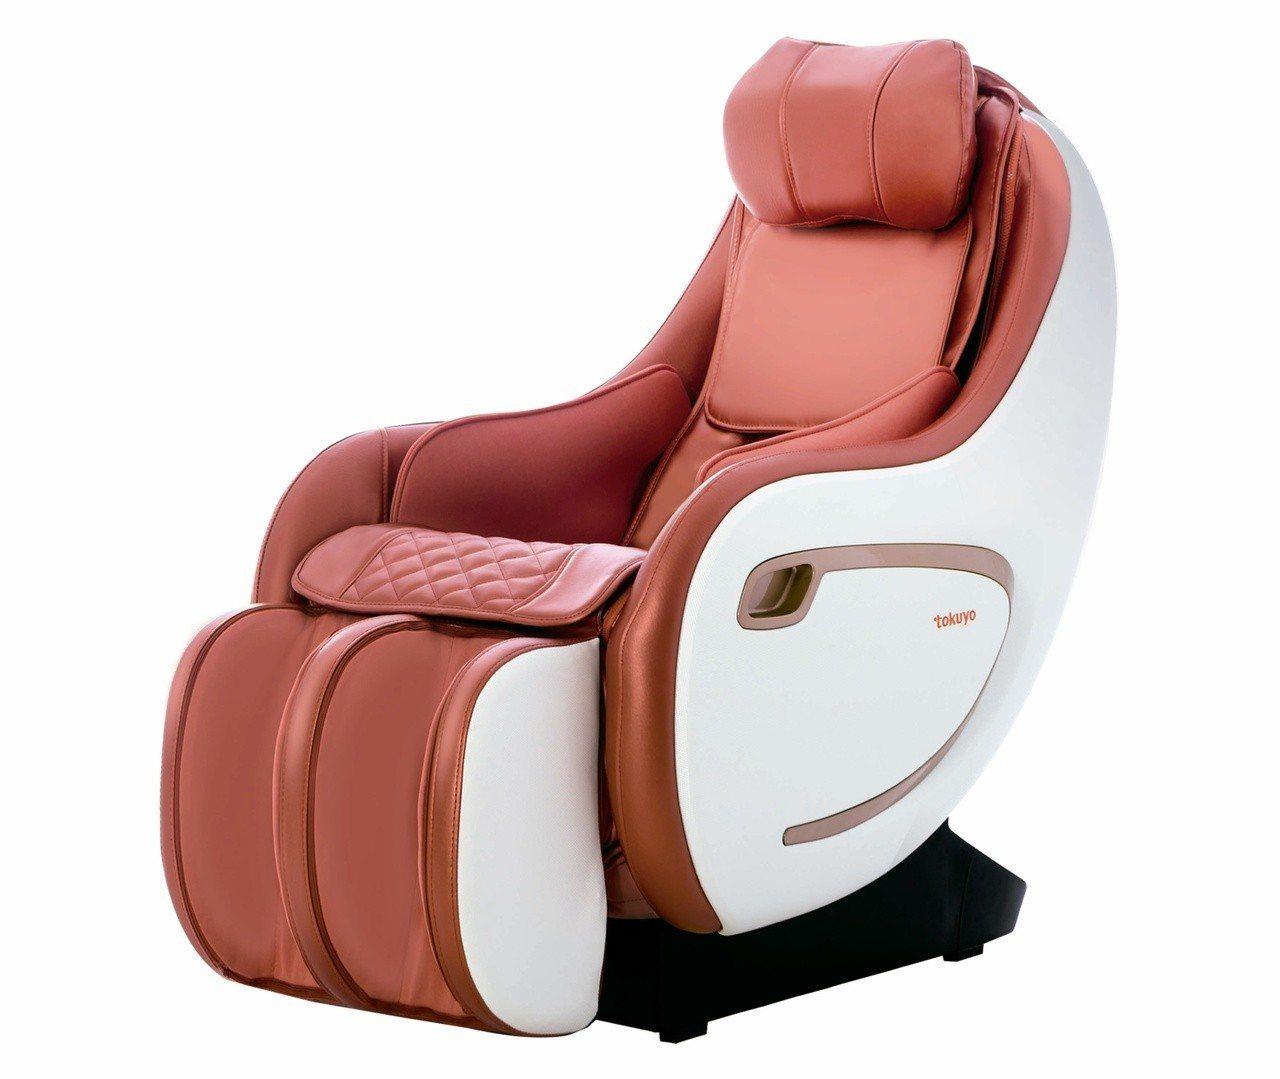 tokuyo Mini玩美椅Plus TC-292,新品預購價33,900元,馬...